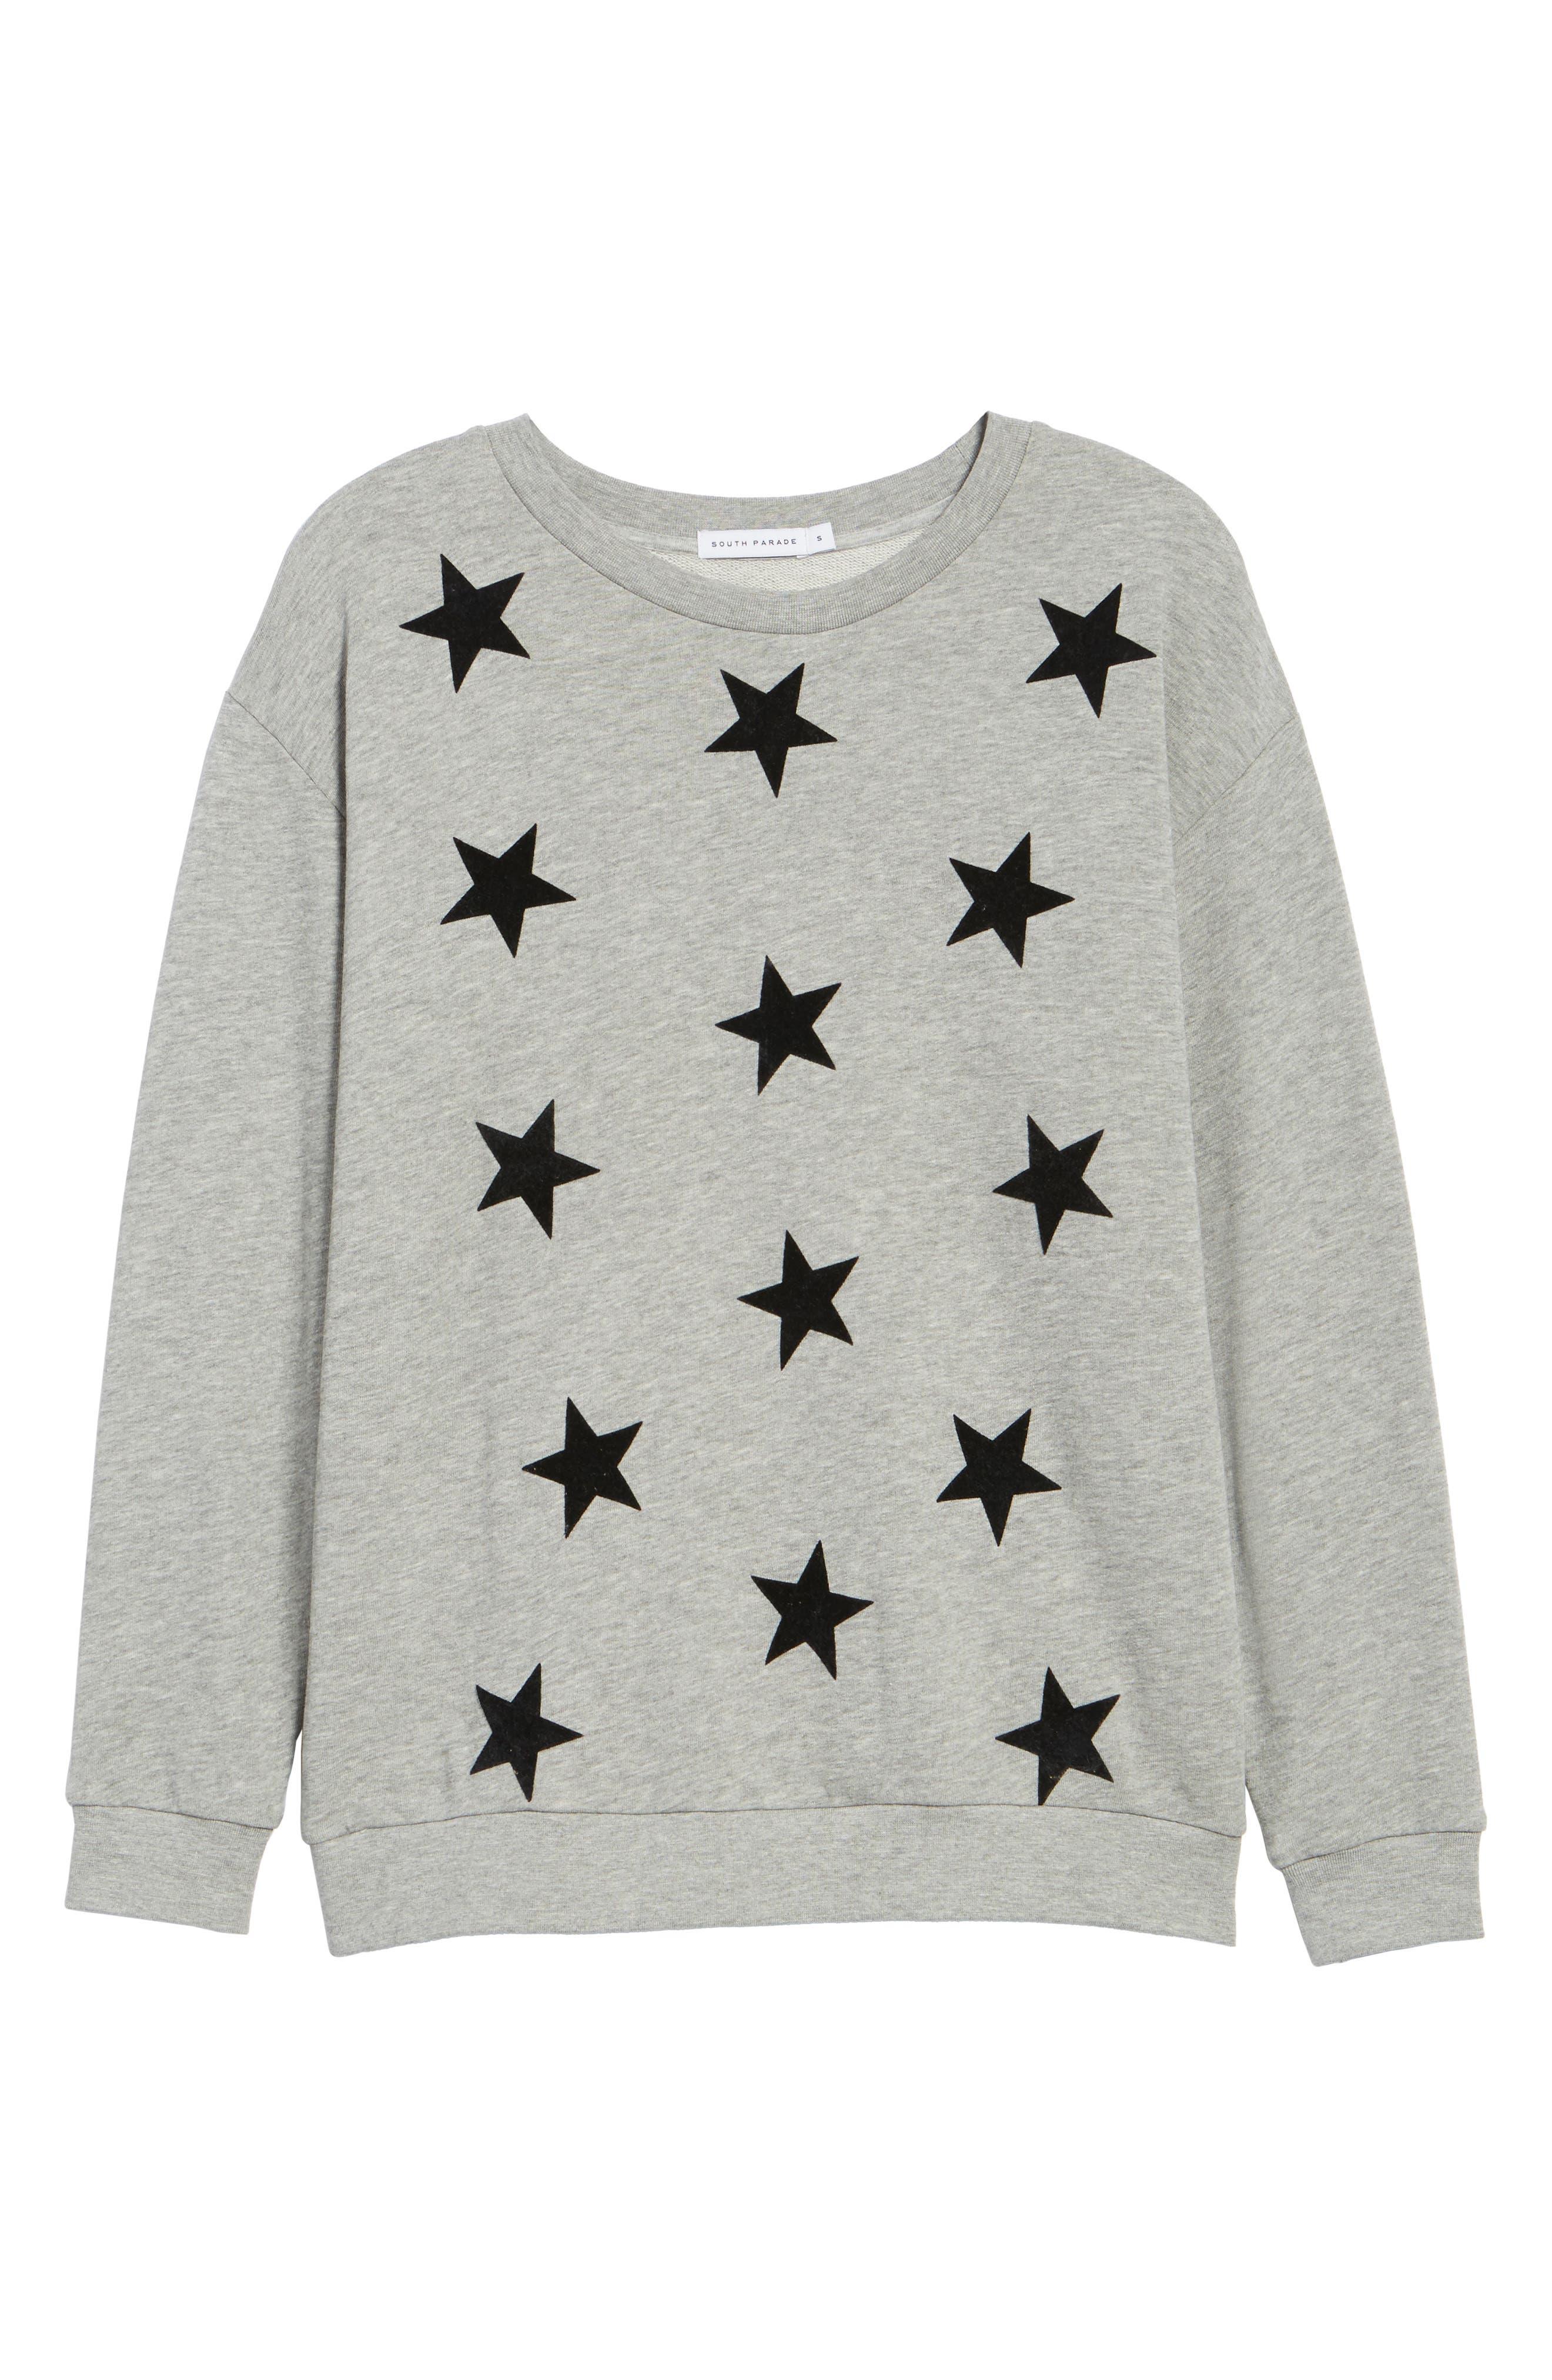 Alexa - Super Stars Sweatshirt,                             Alternate thumbnail 6, color,                             GREY